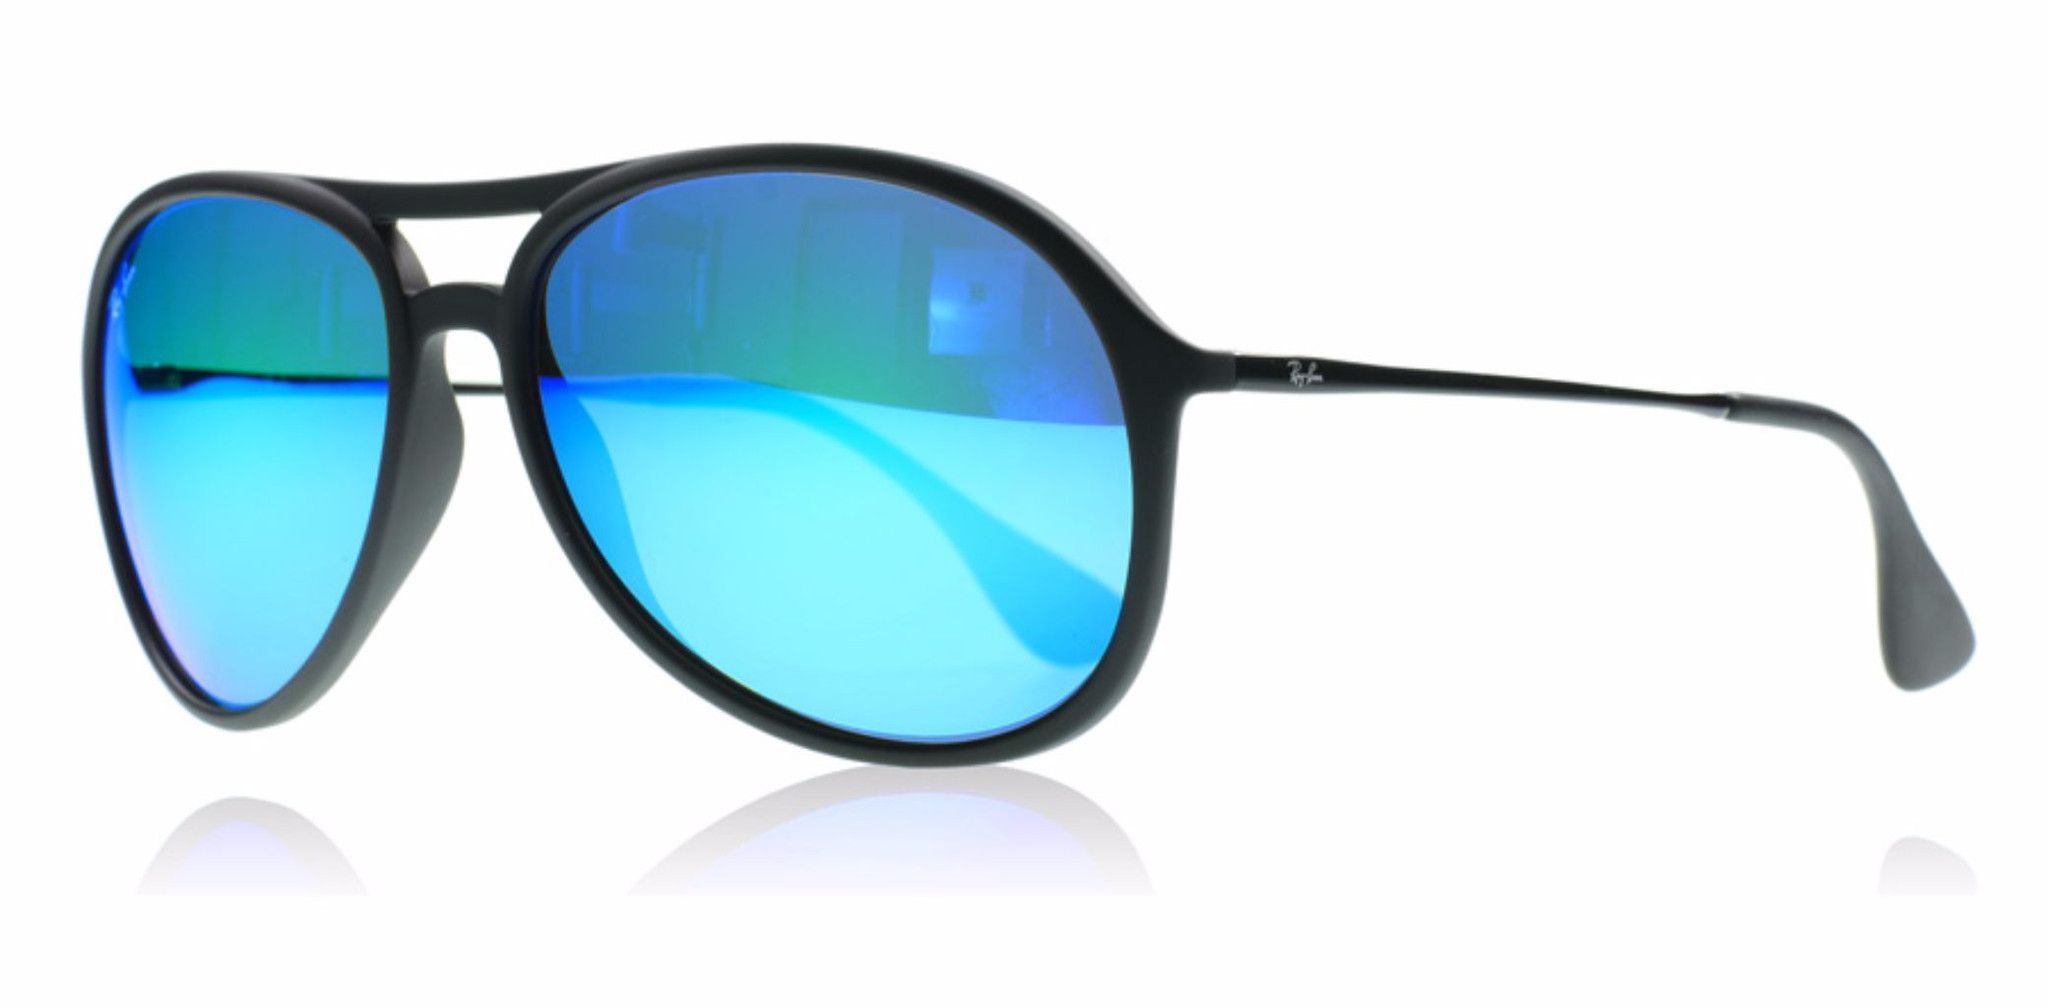 Ray-Ban RB4201 Sunglasses